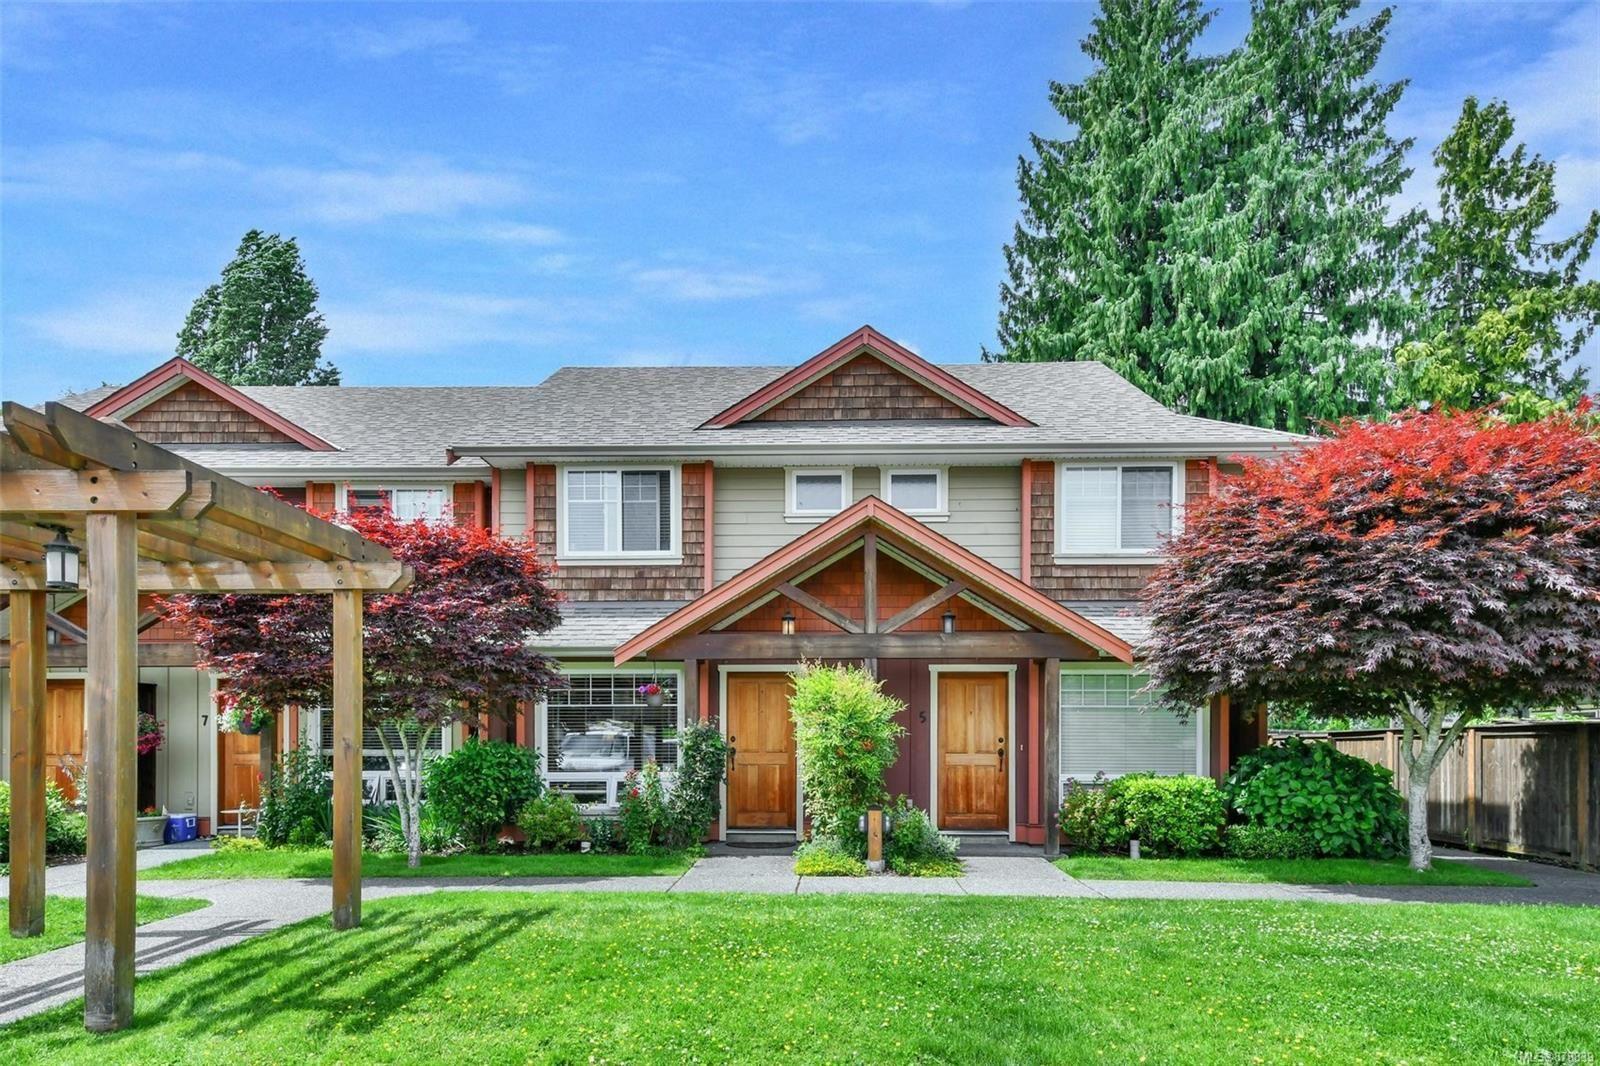 Main Photo: 6 2528 Alexander St in : Du East Duncan Row/Townhouse for sale (Duncan)  : MLS®# 878839